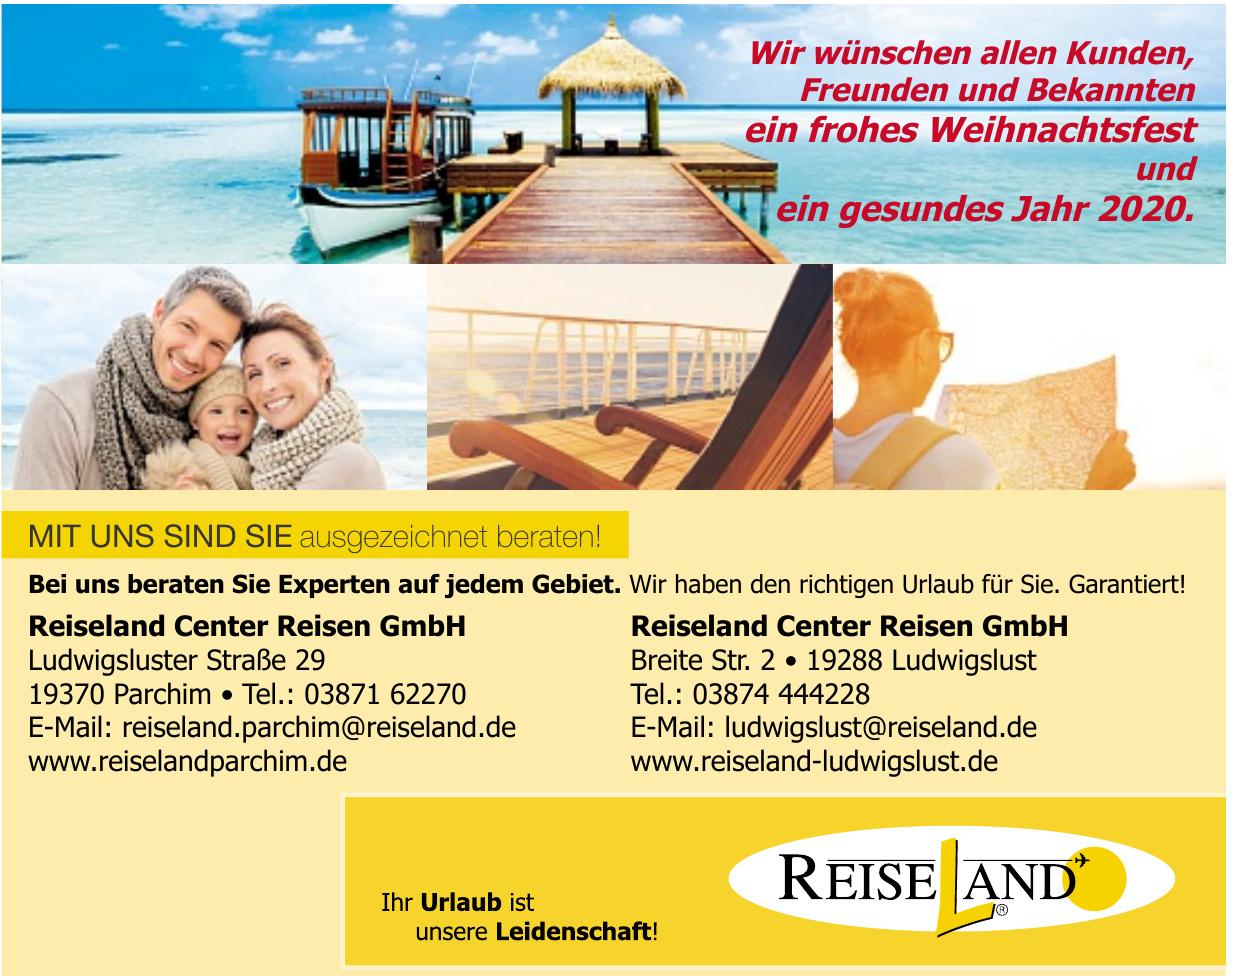 Reiseland Center Reisen GmbH